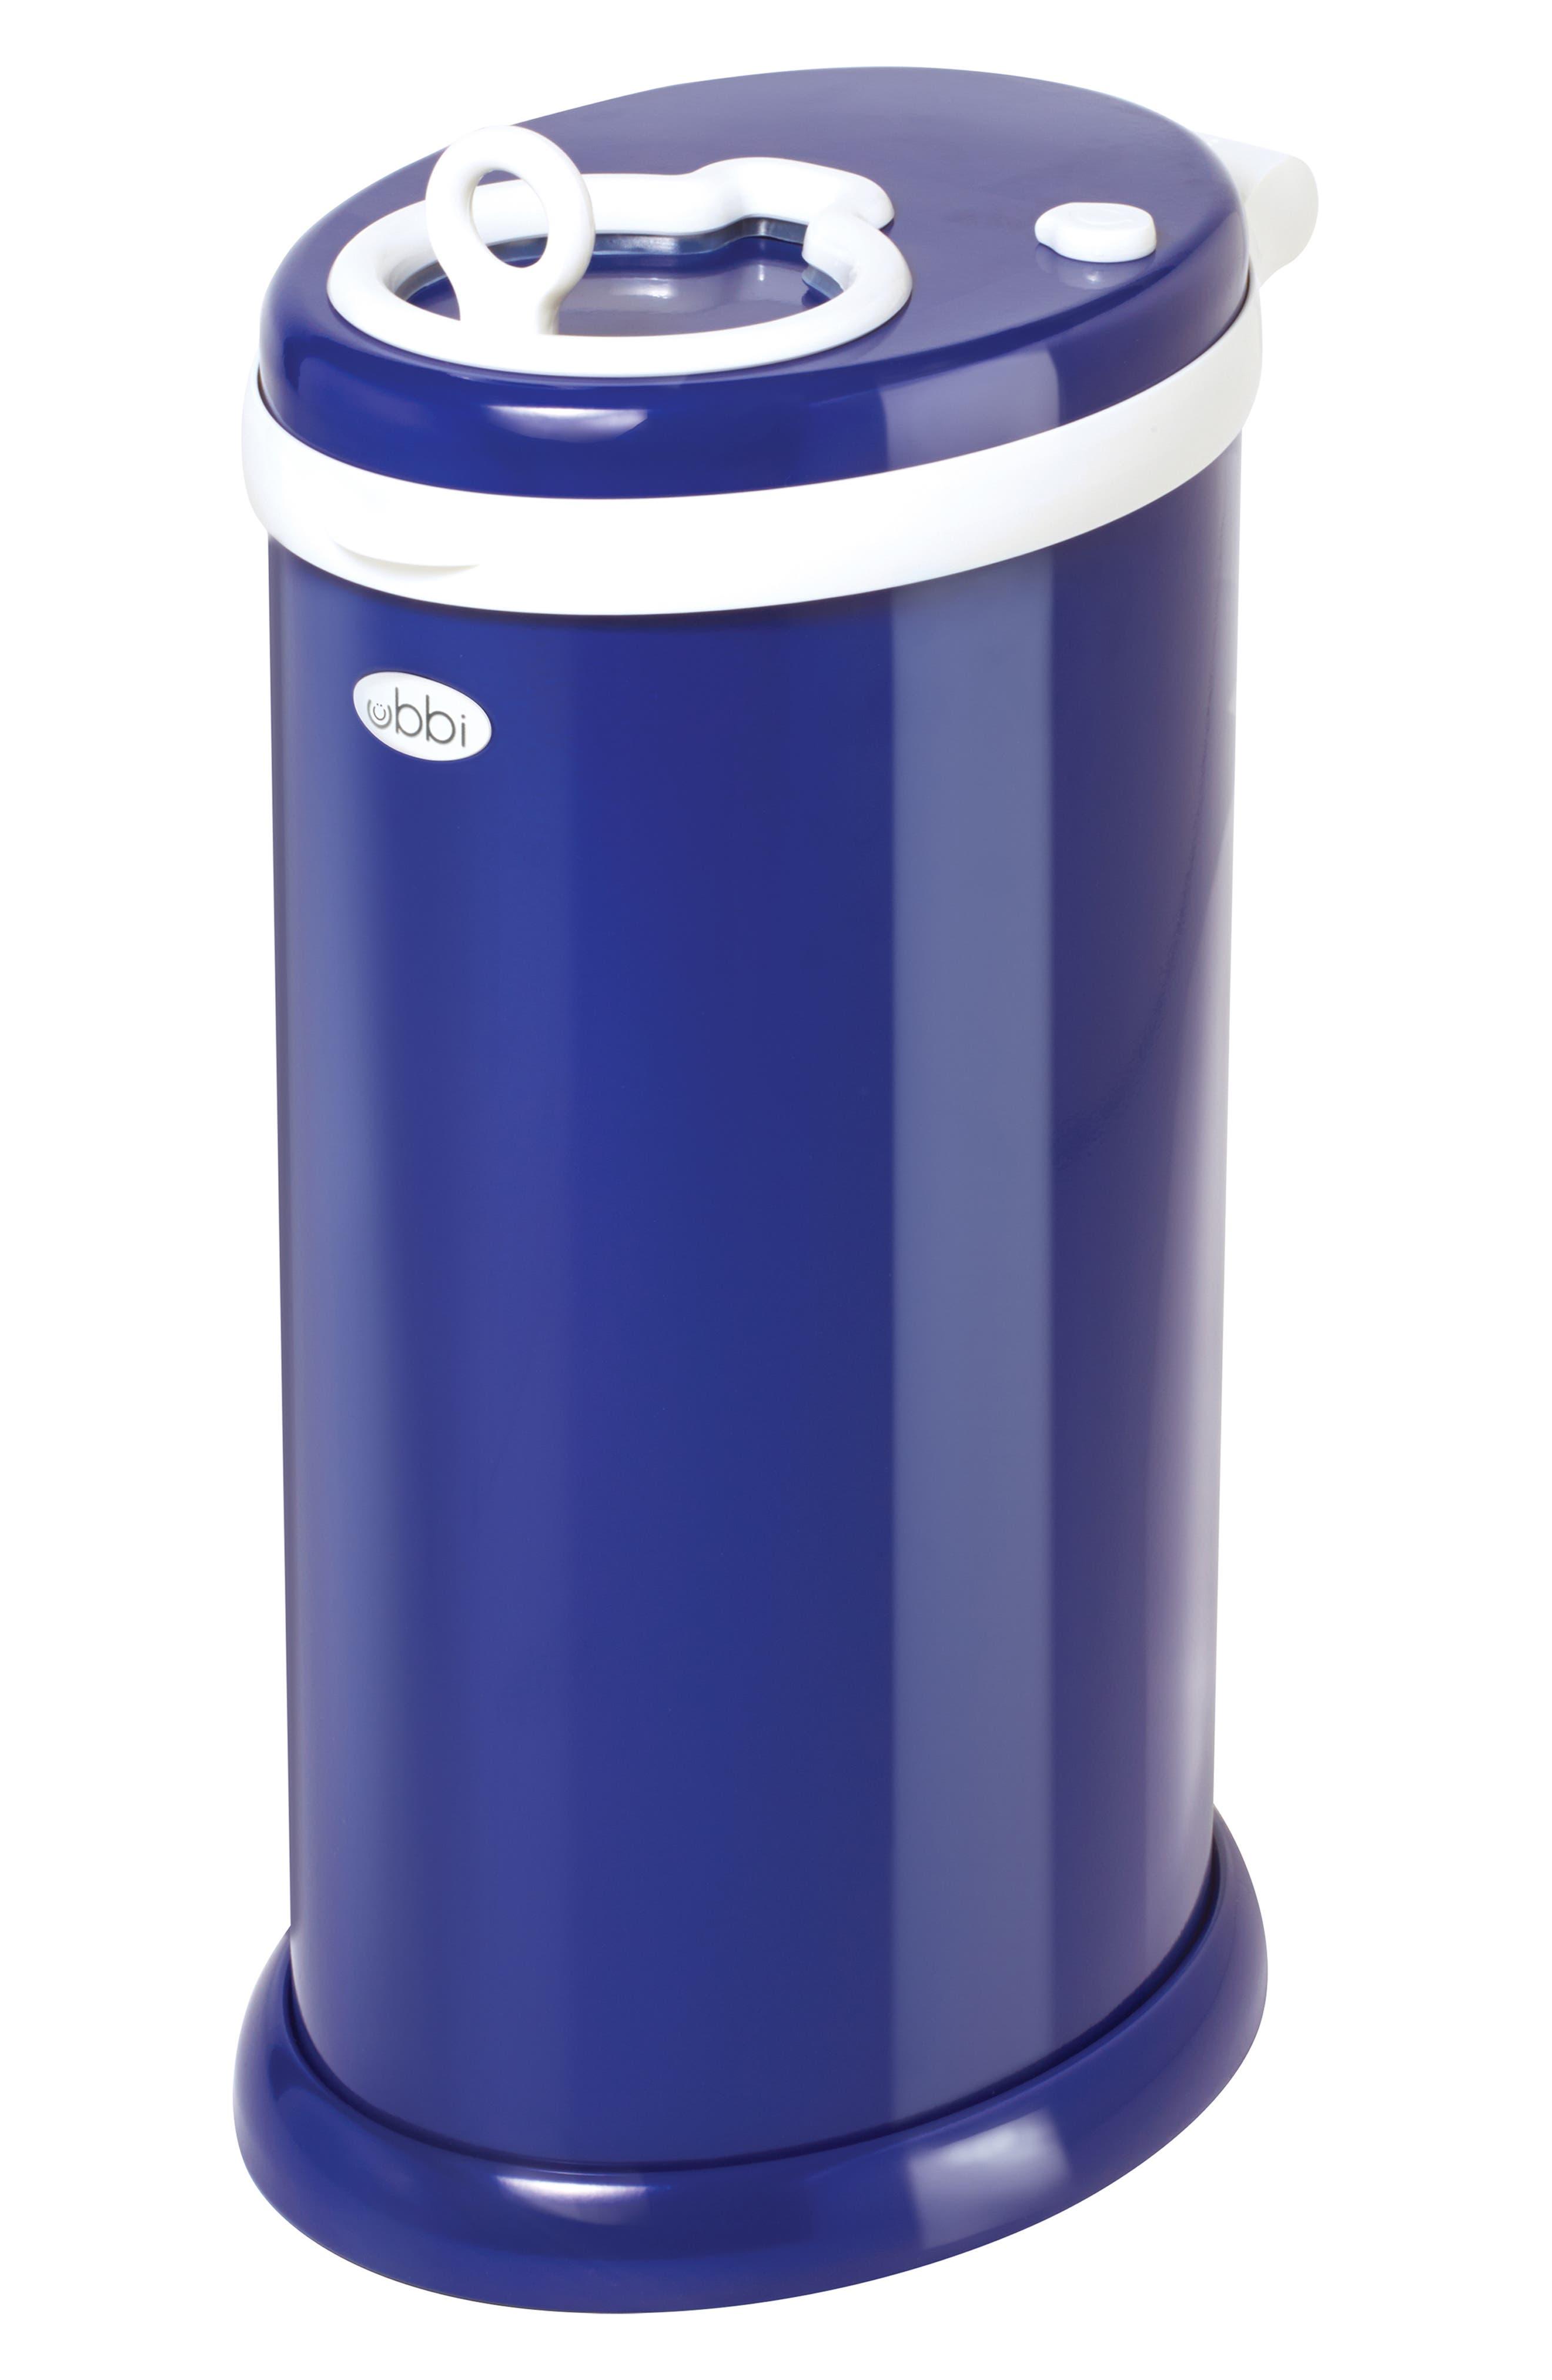 Ubbi Diaper Pail Size One Size  Blue